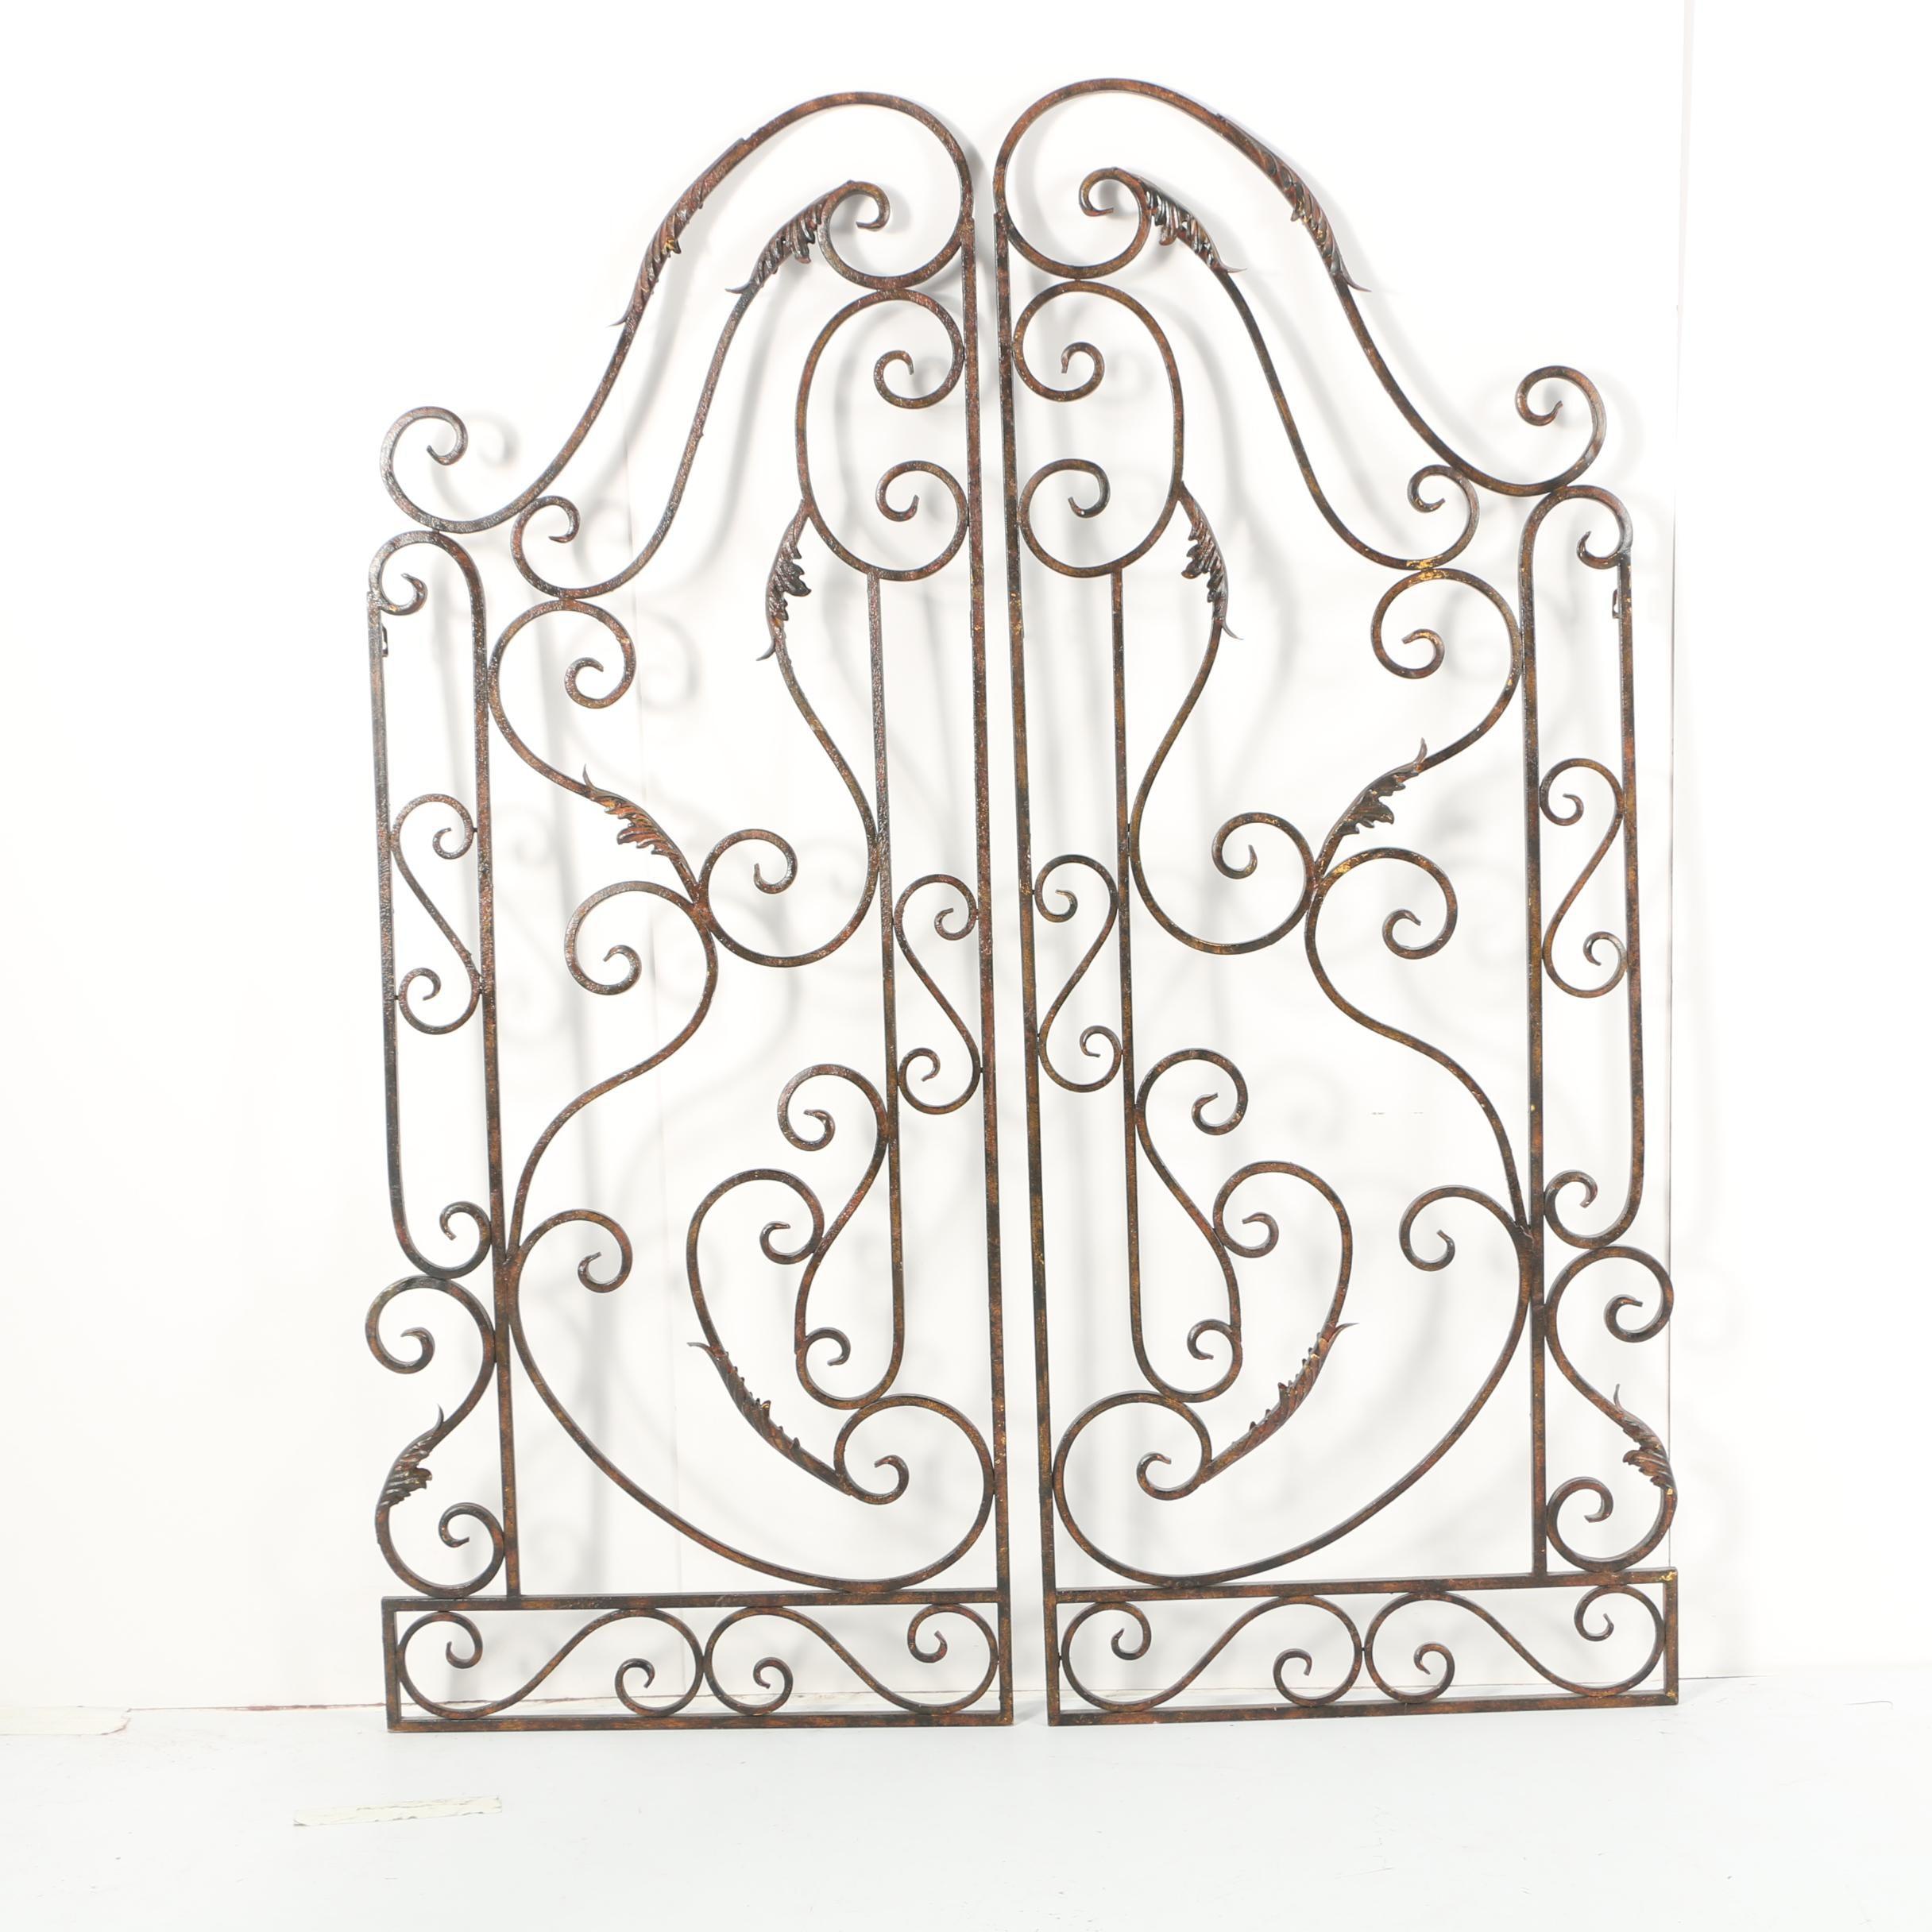 Decorative Scrolled Metalwork Gate Wall Hangings